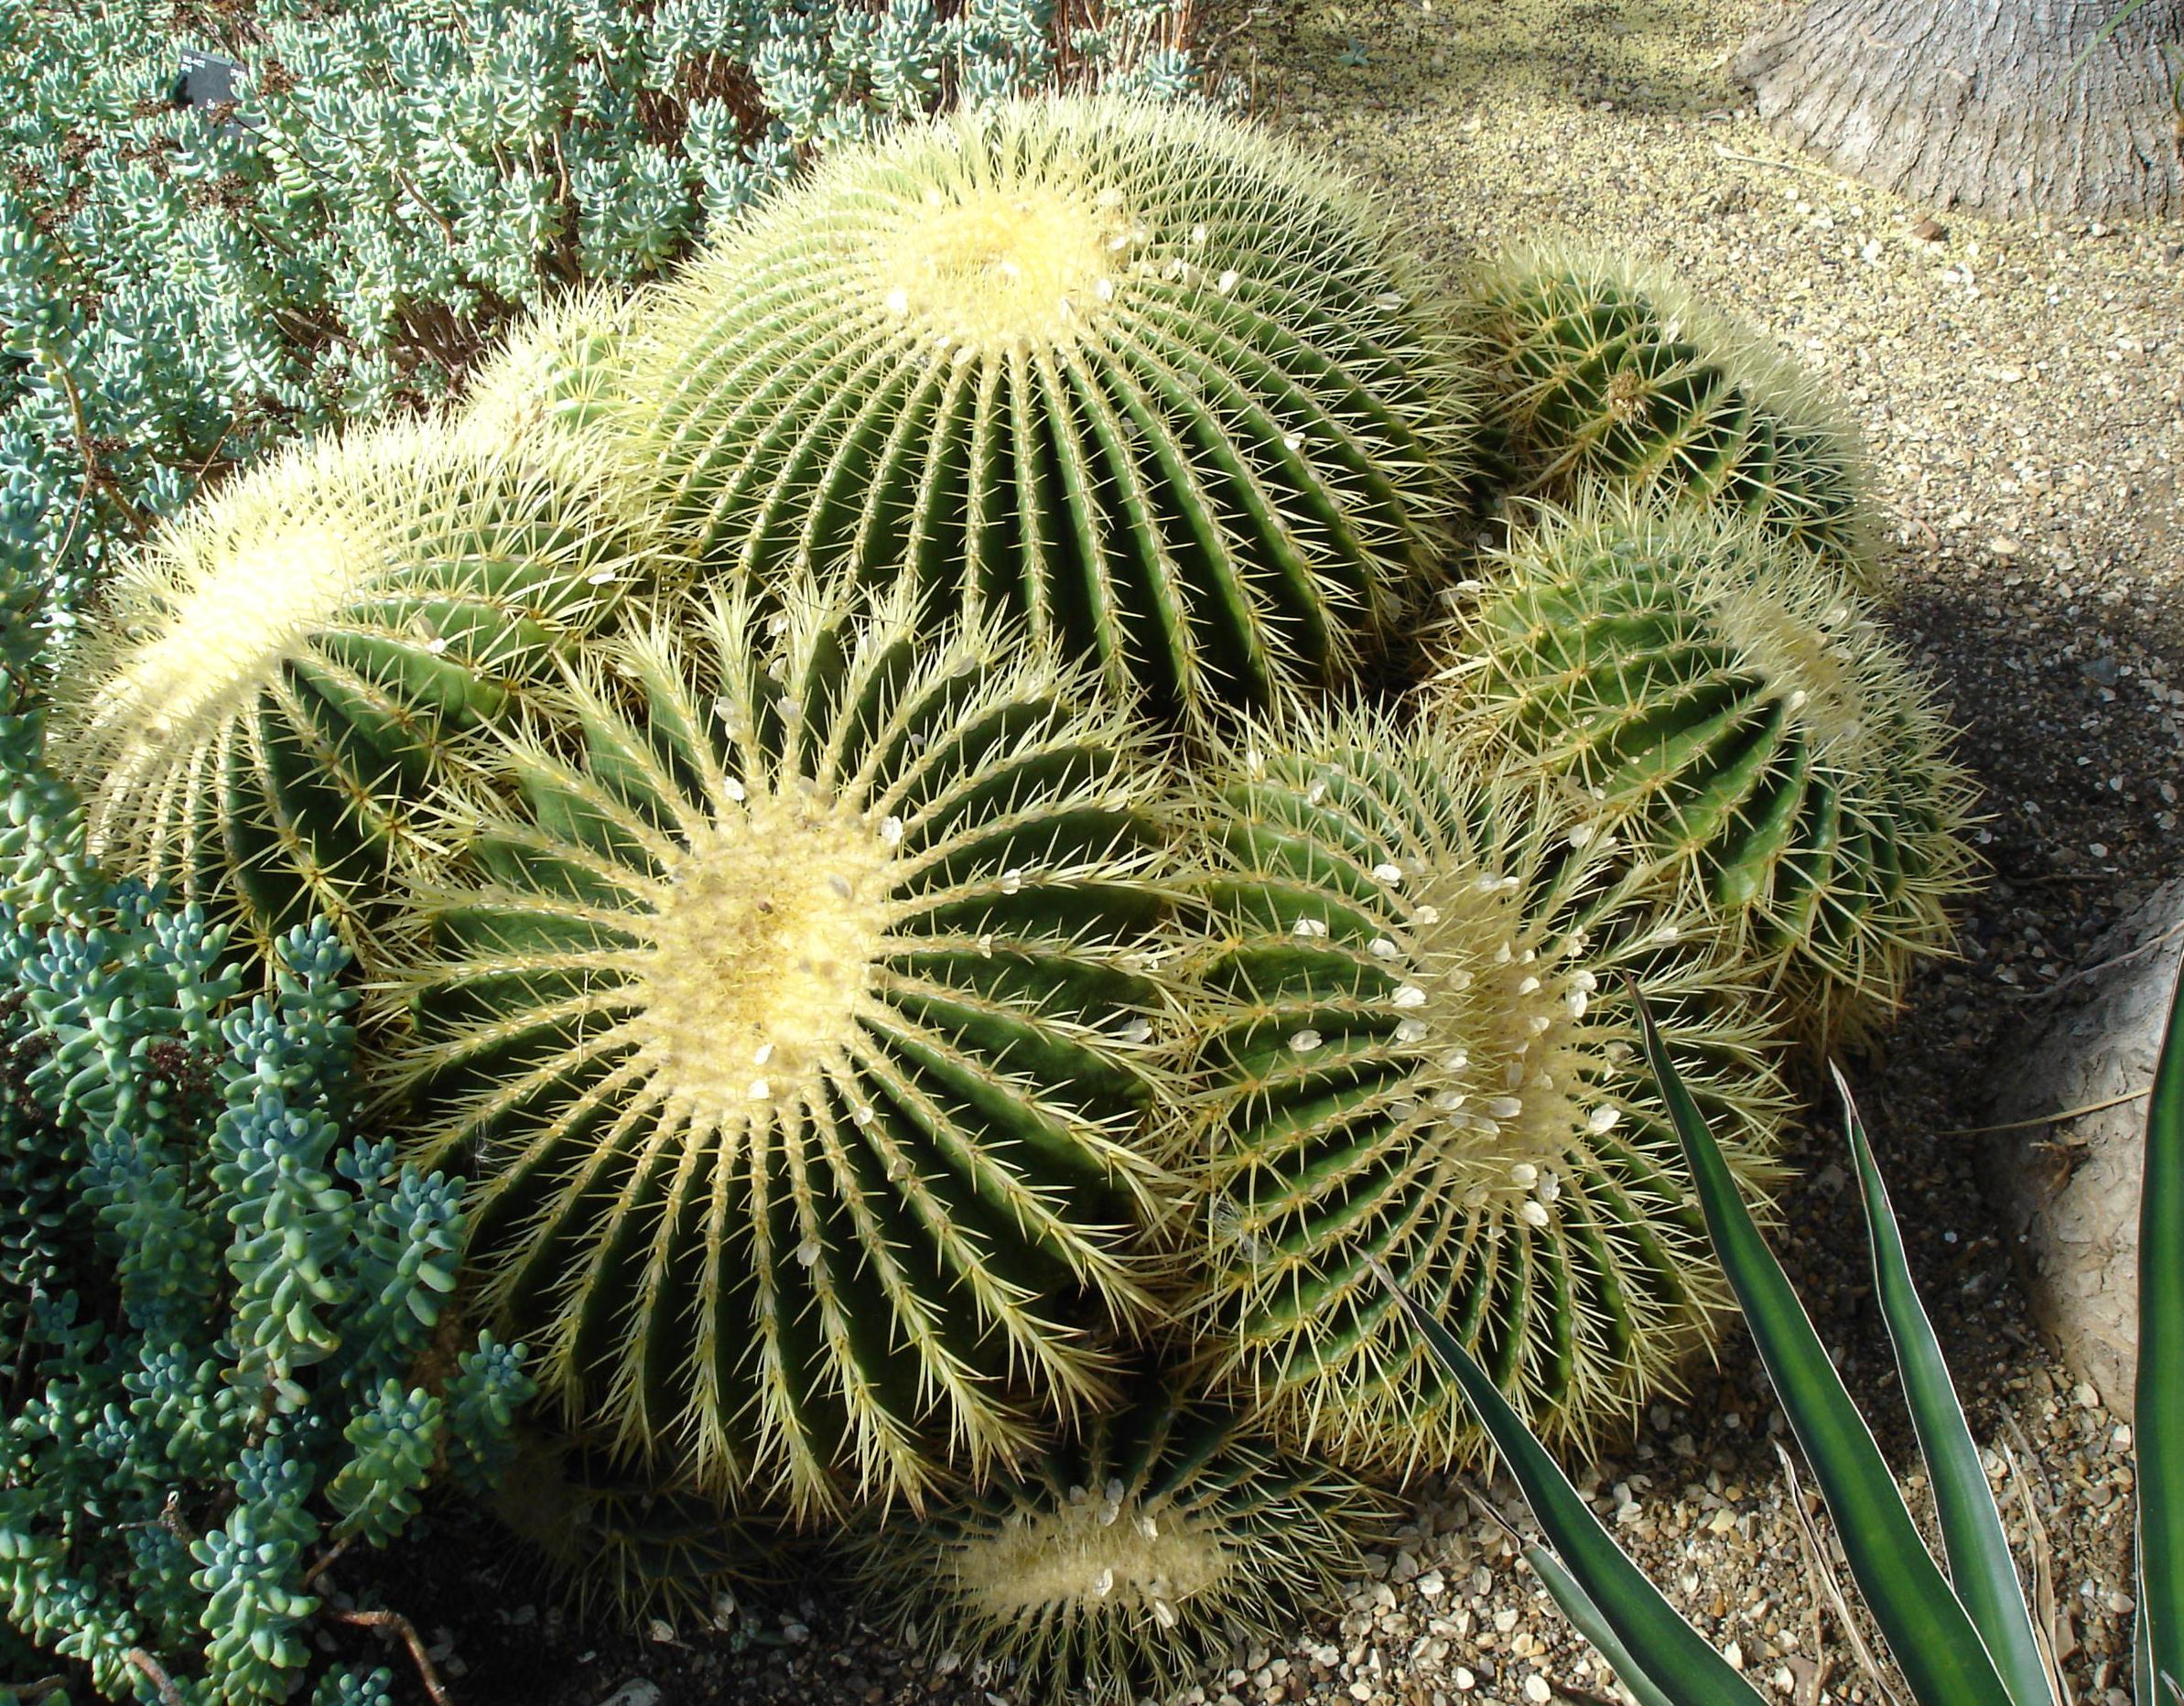 Barrel Cactus Adaptations Barrel Cactus Are Often Grown